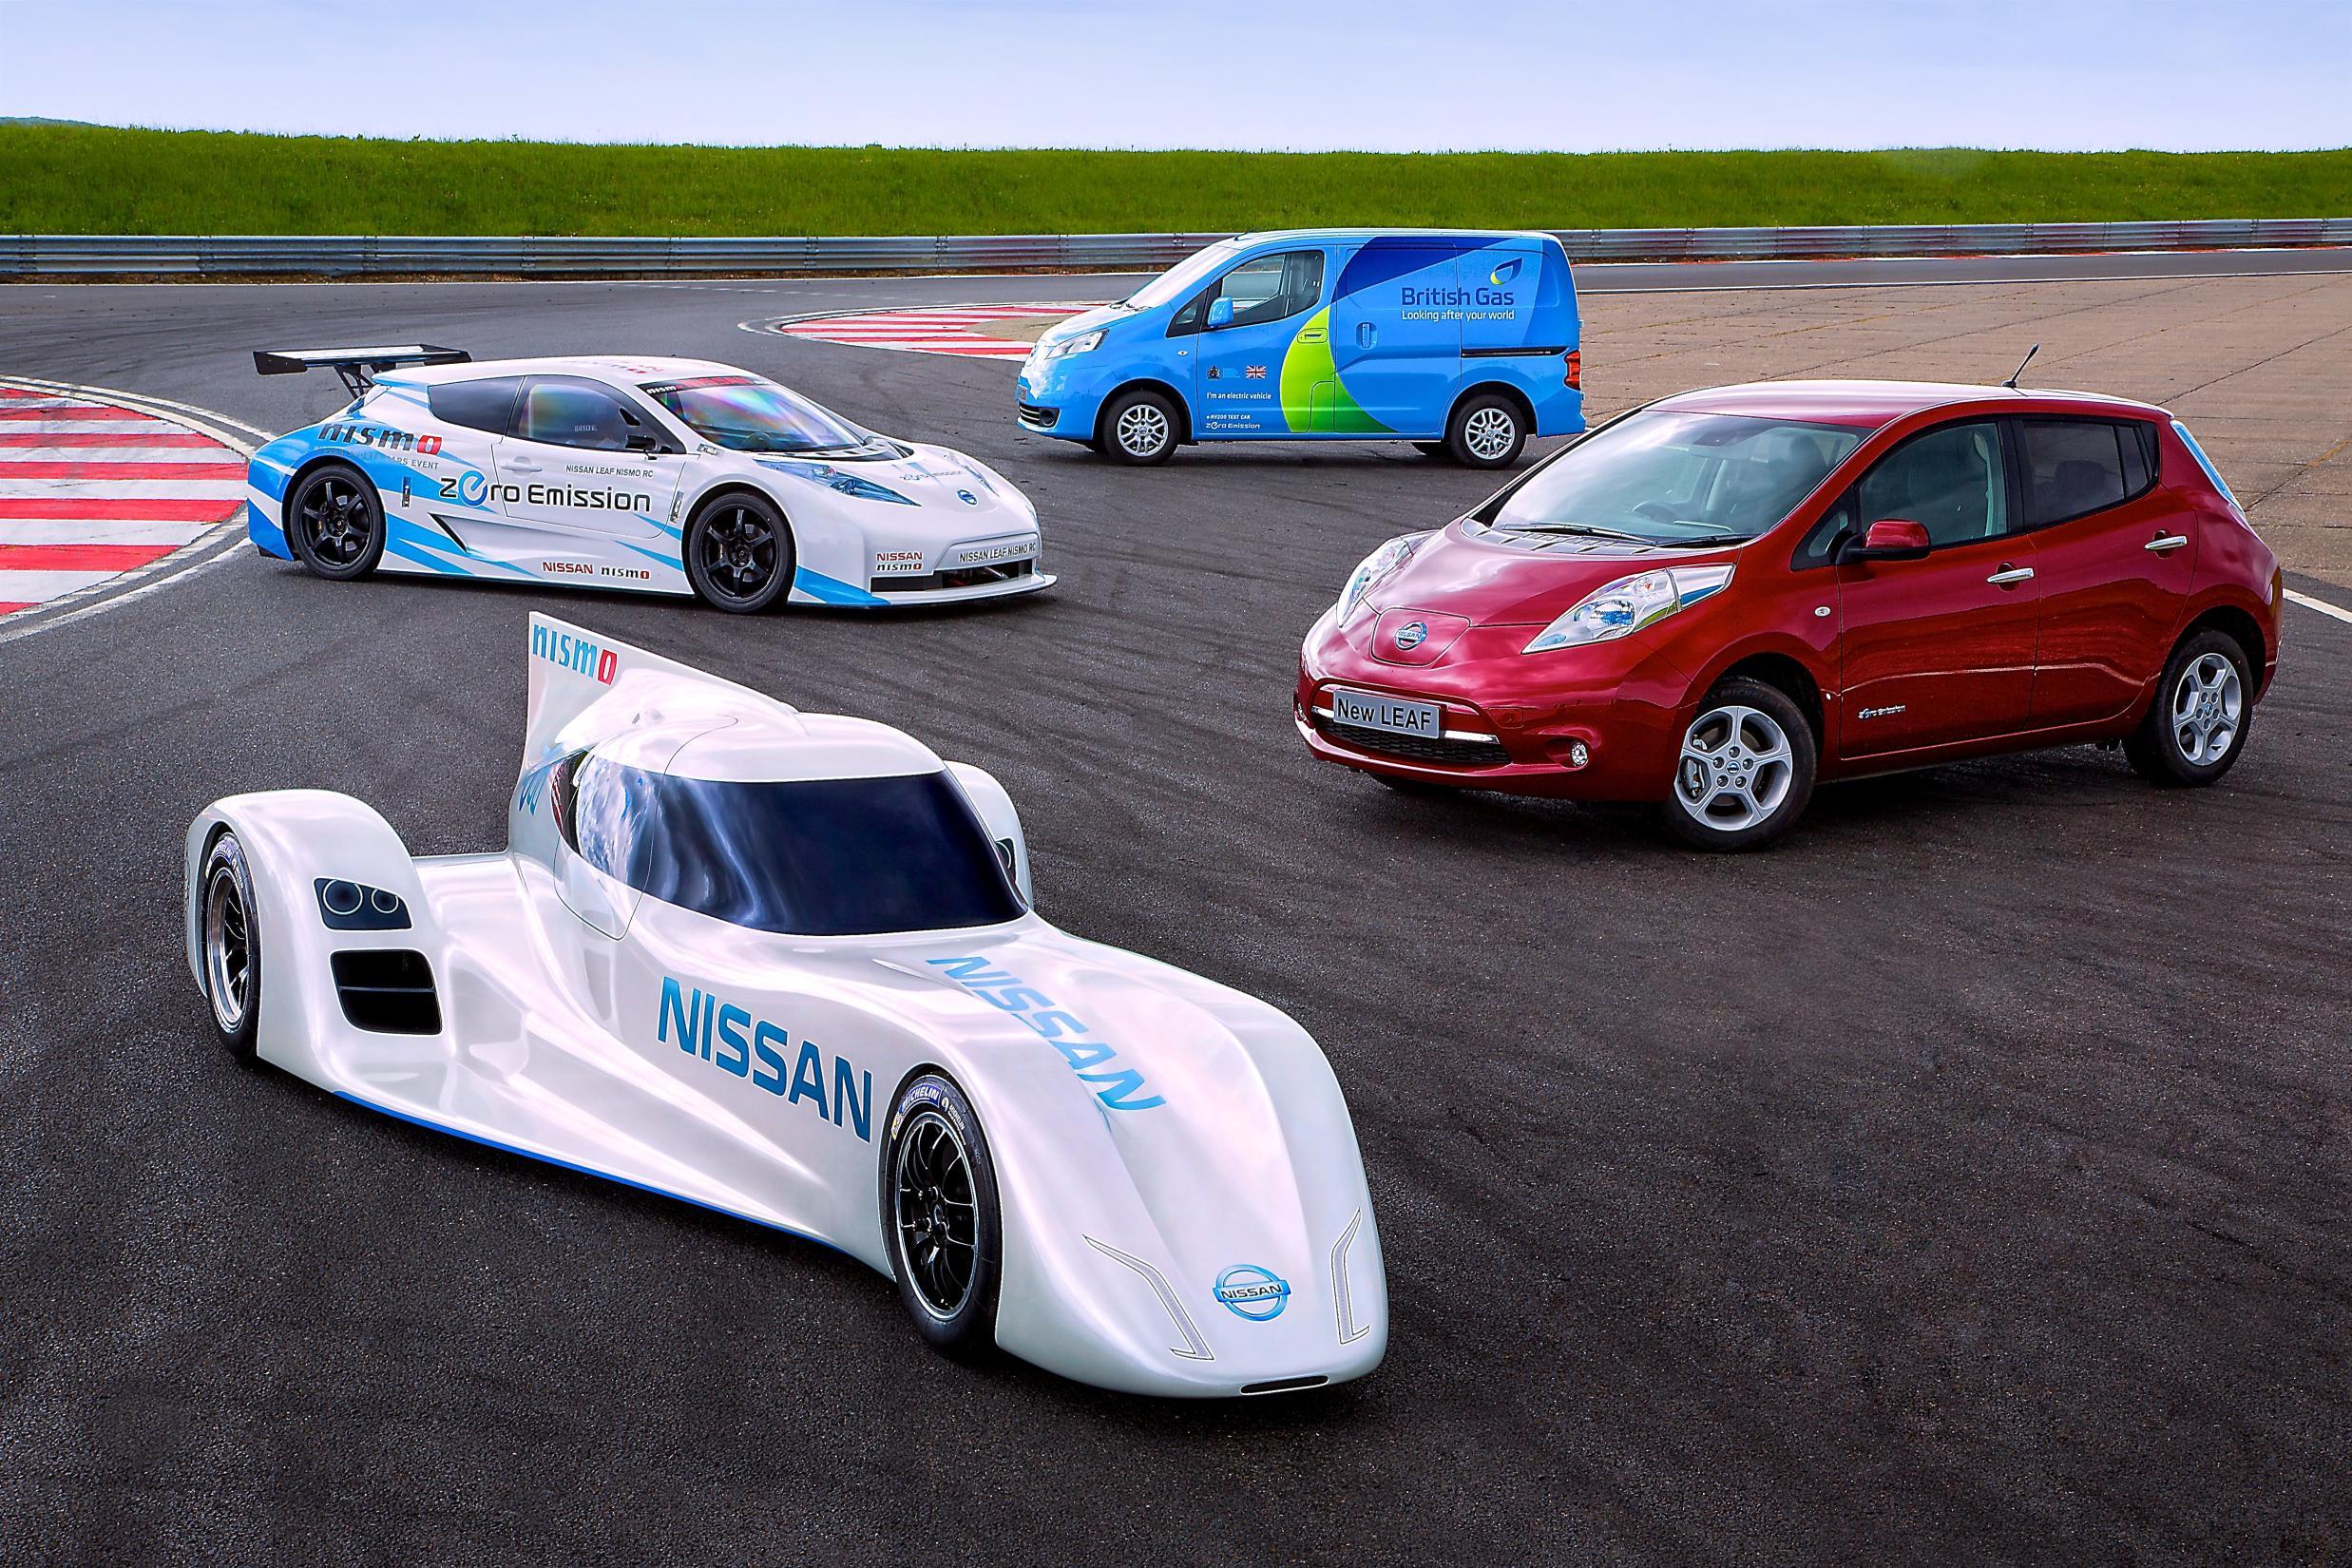 The worlds fastest electric car -  Nissan Zeod Rc Nissan Leaf